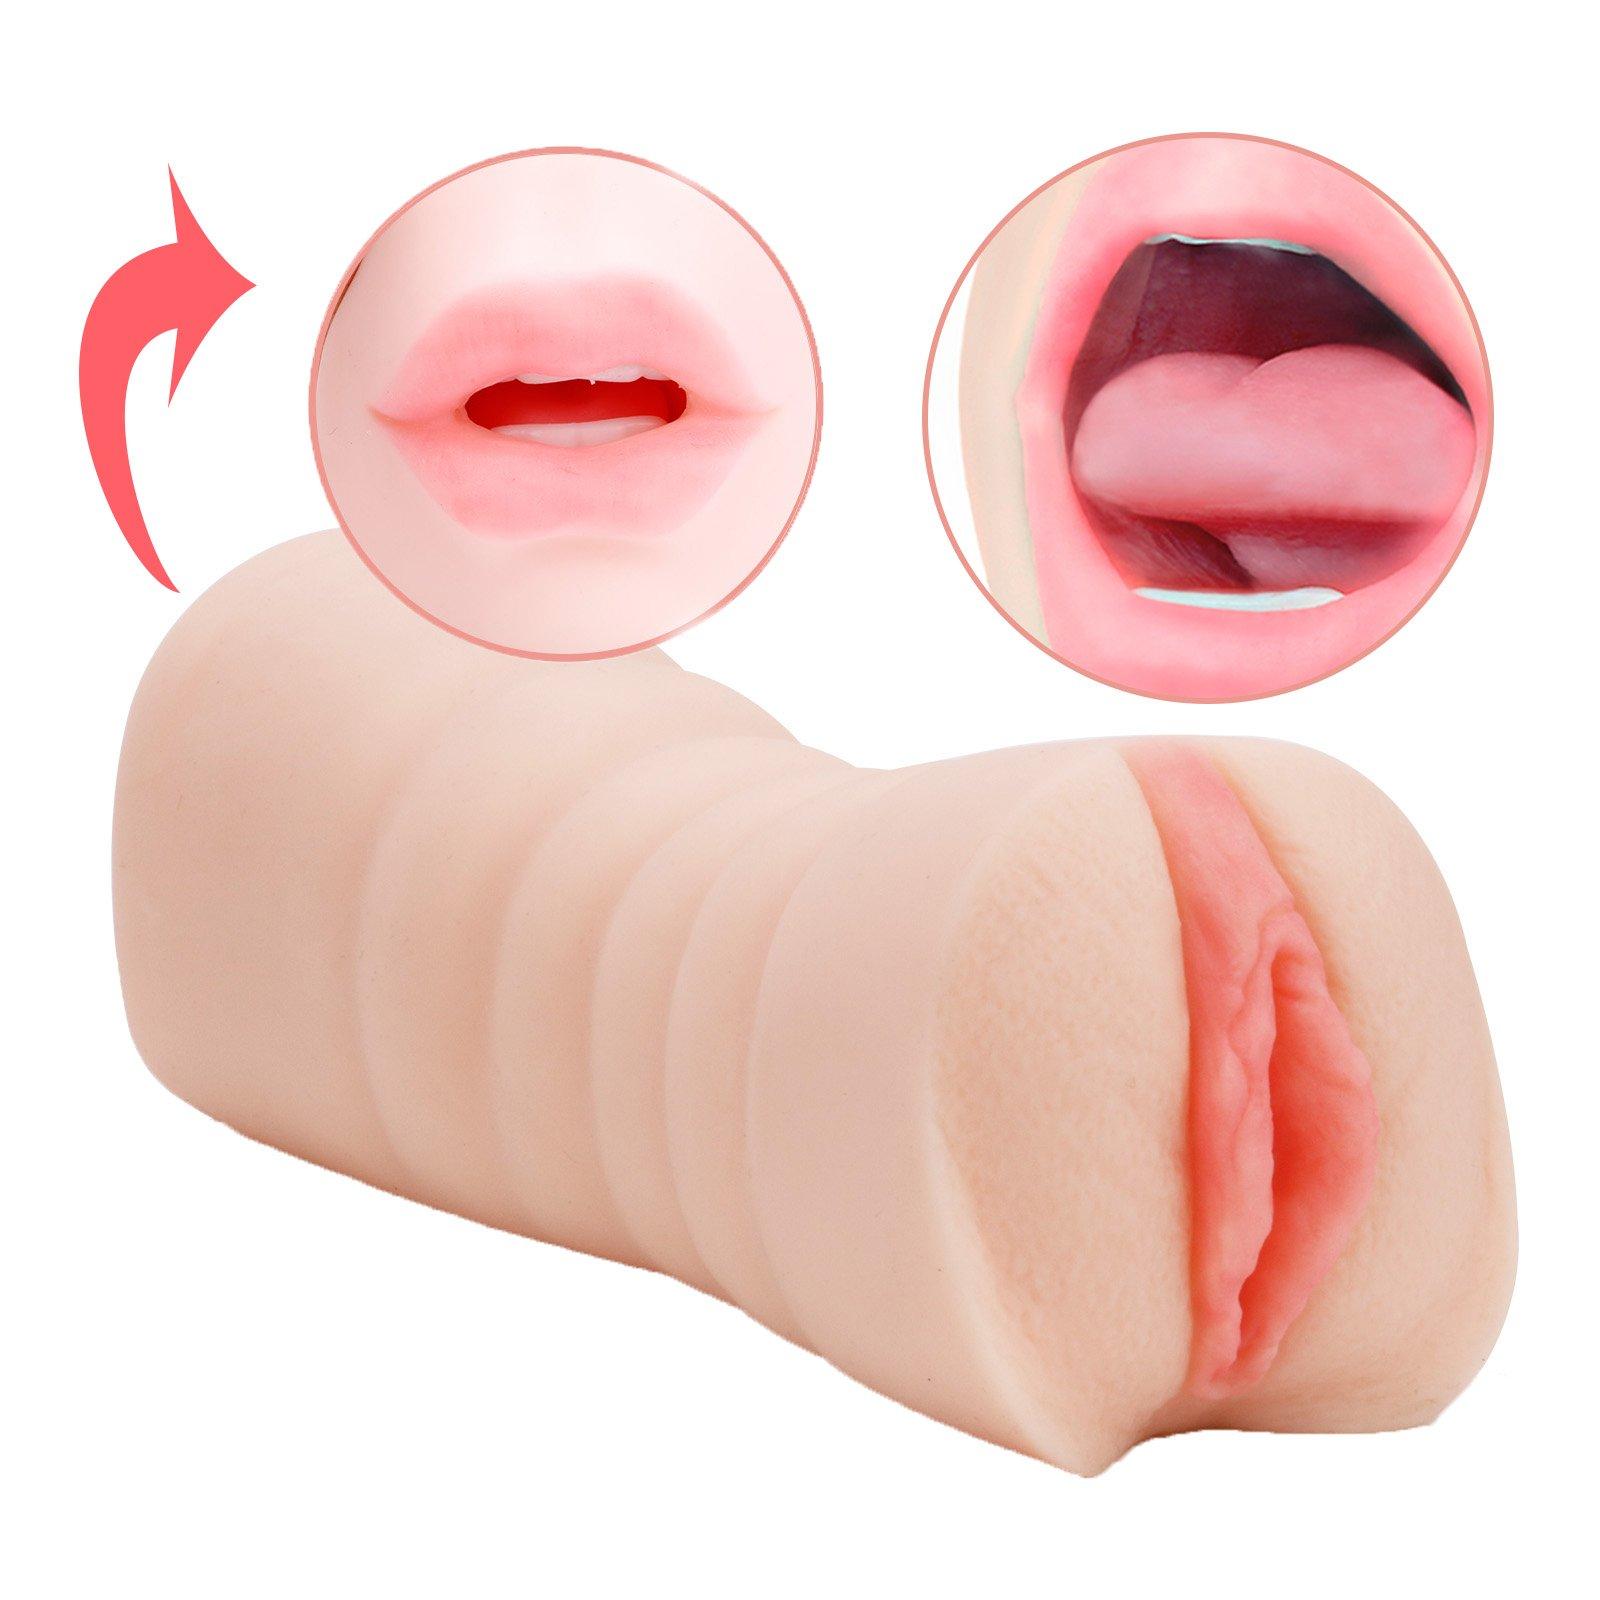 Male Masturbators, Riodong Pocket Pussy Blow Job Stroker Vaginal Oral Sex Toys for Male Masturbation (flesh)